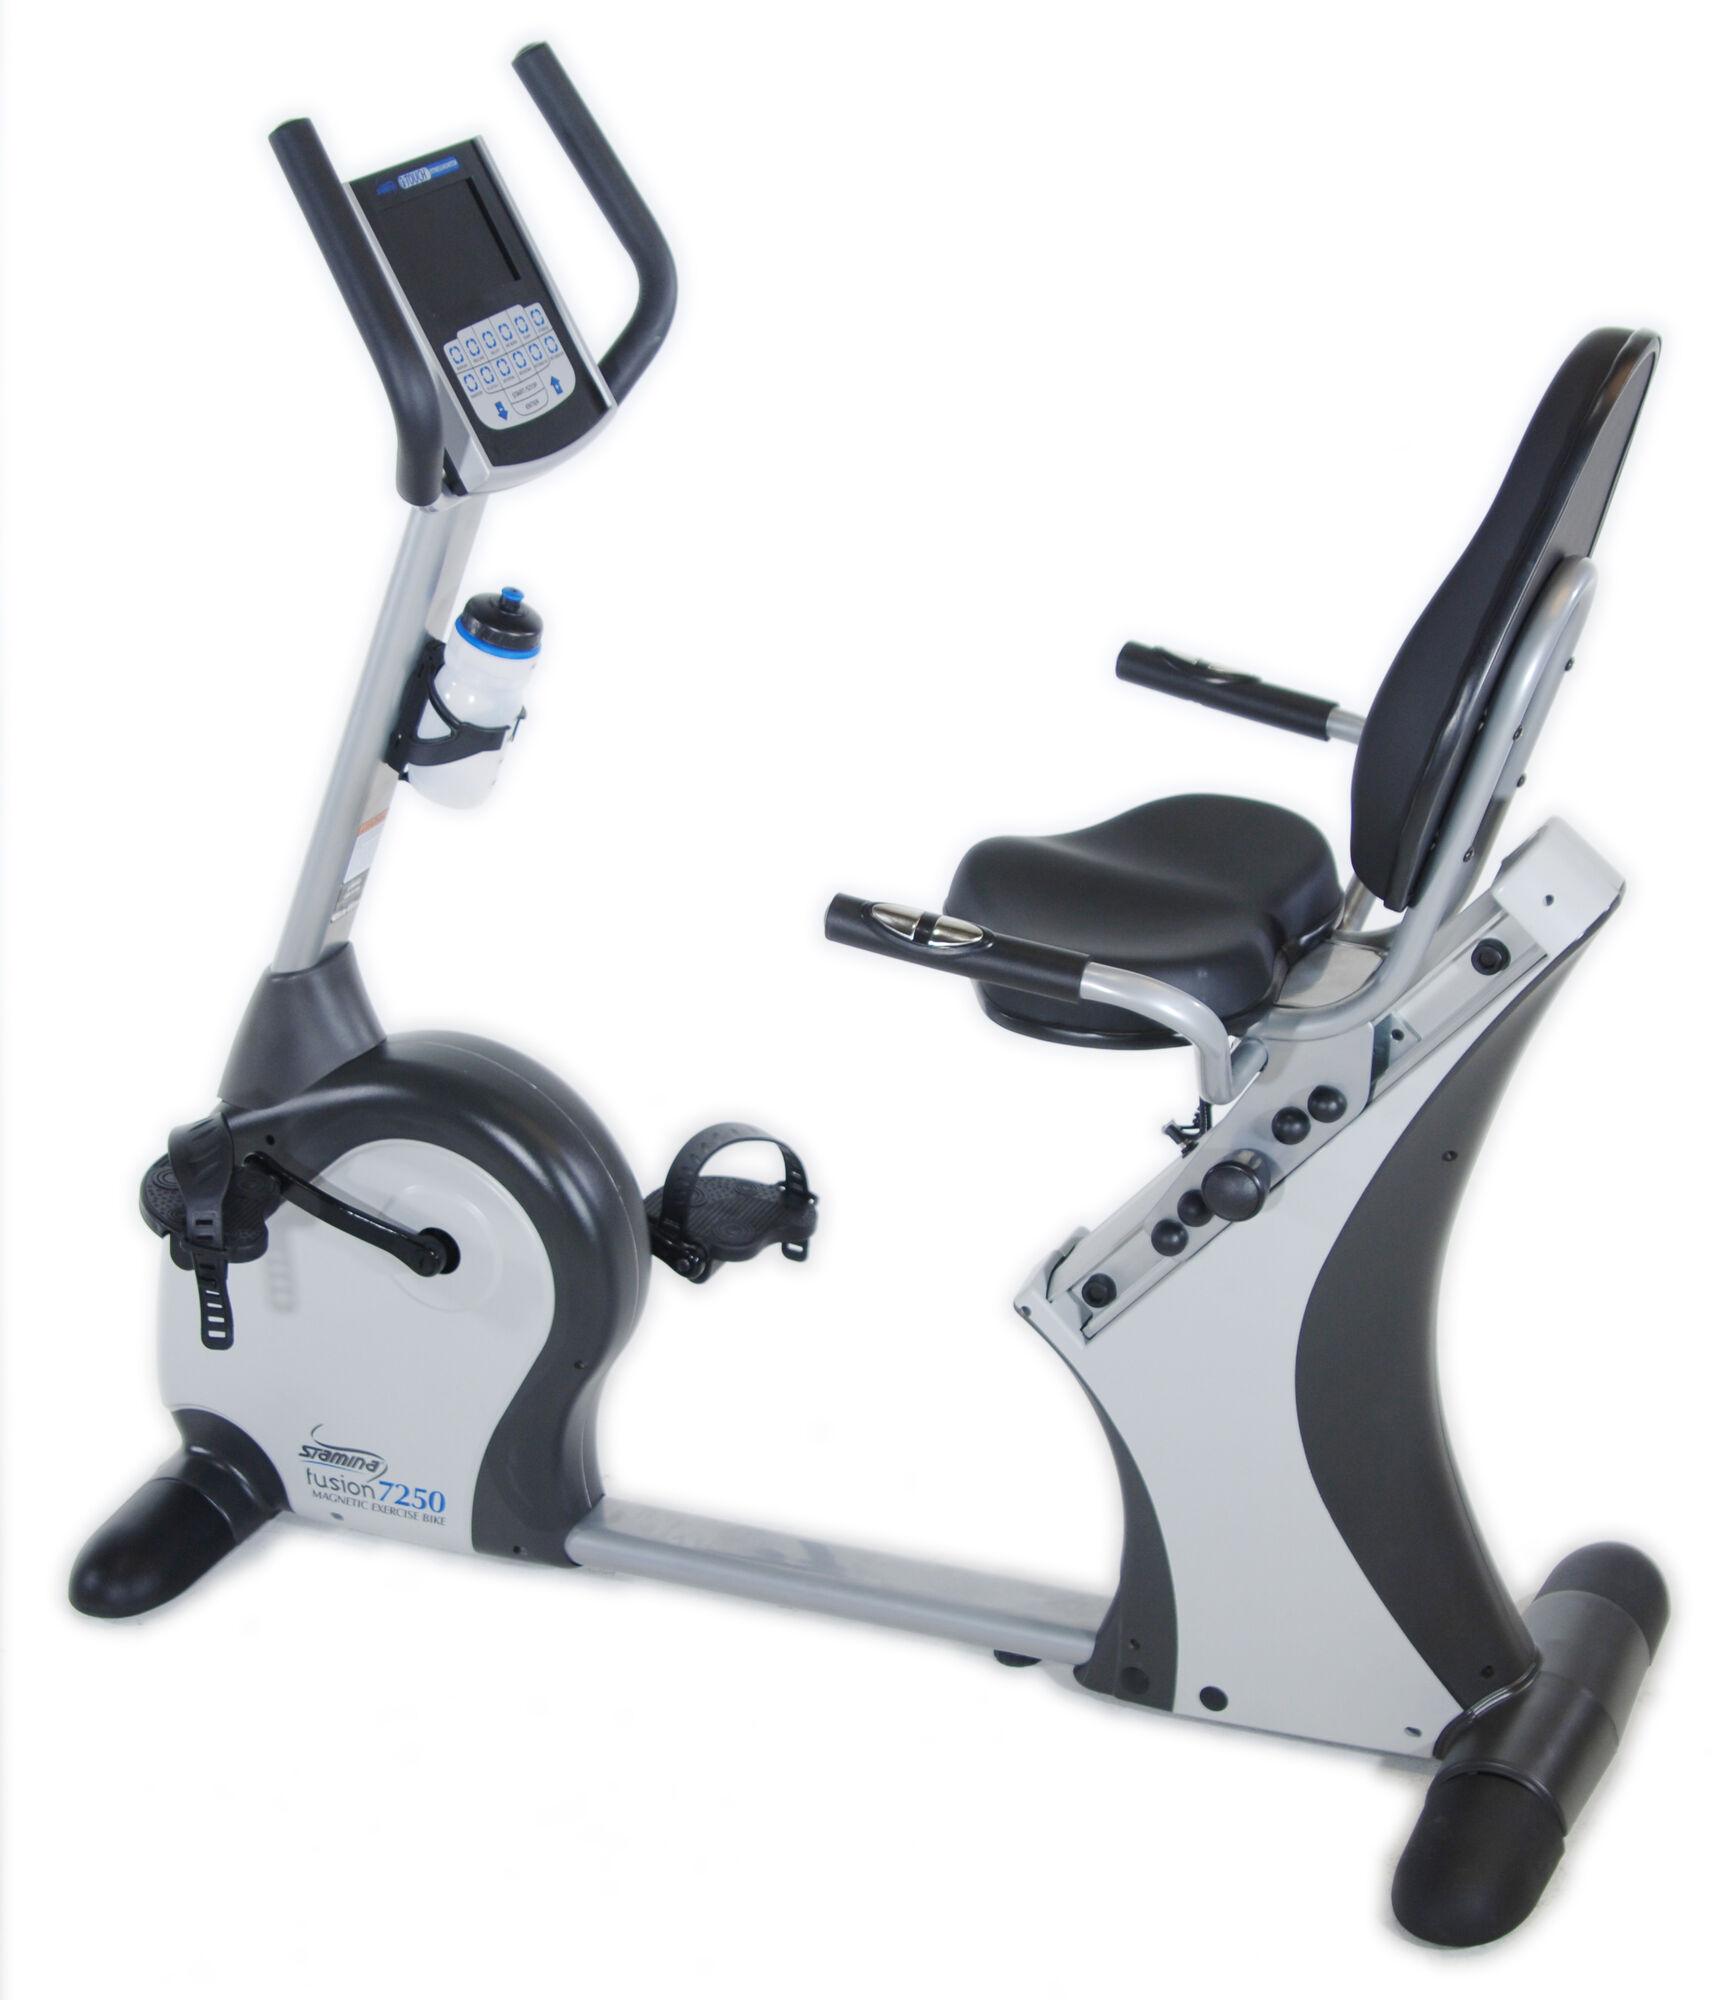 Exercise Bikes Stationary Rebent Bike Spinners Magnetic Upright Excel Star Trac Weslo Kettler Edge Sci Fit Schwinn Trikke